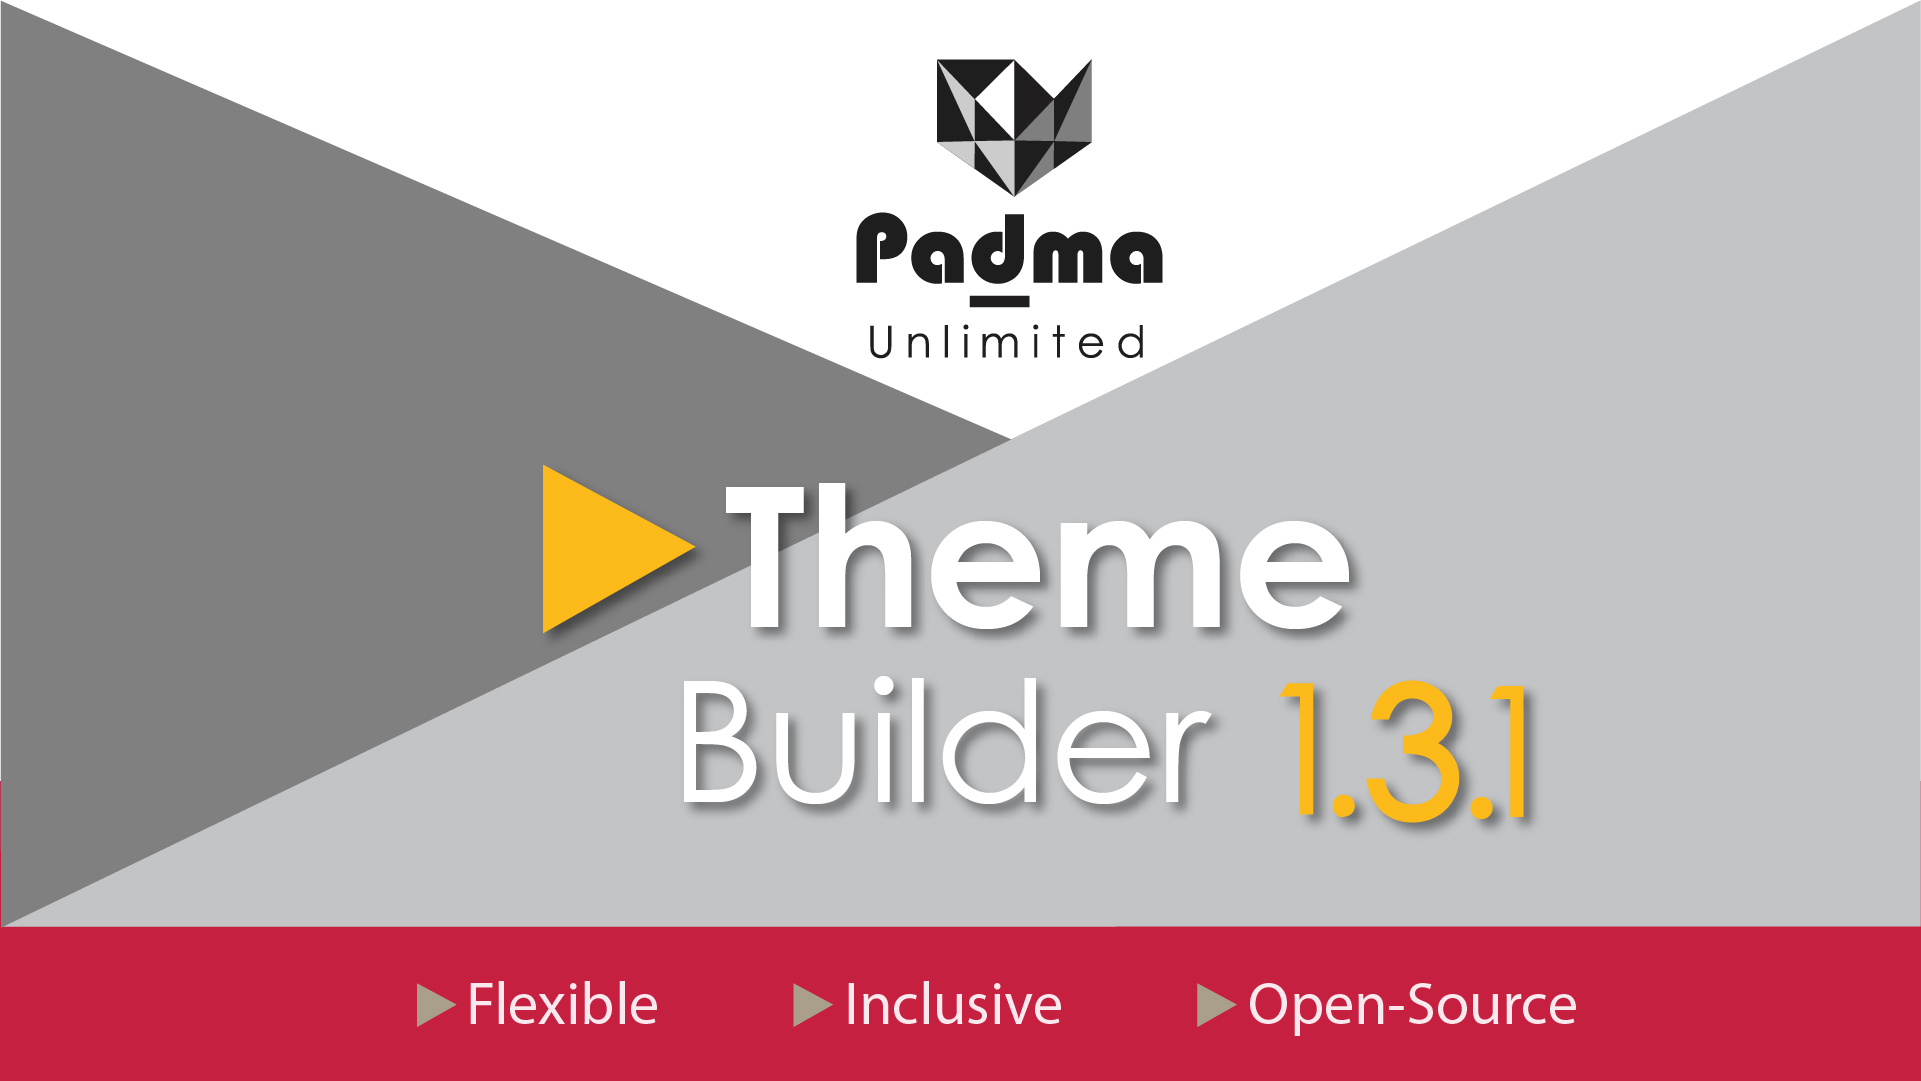 Padma Theme versión 1.3 liberada